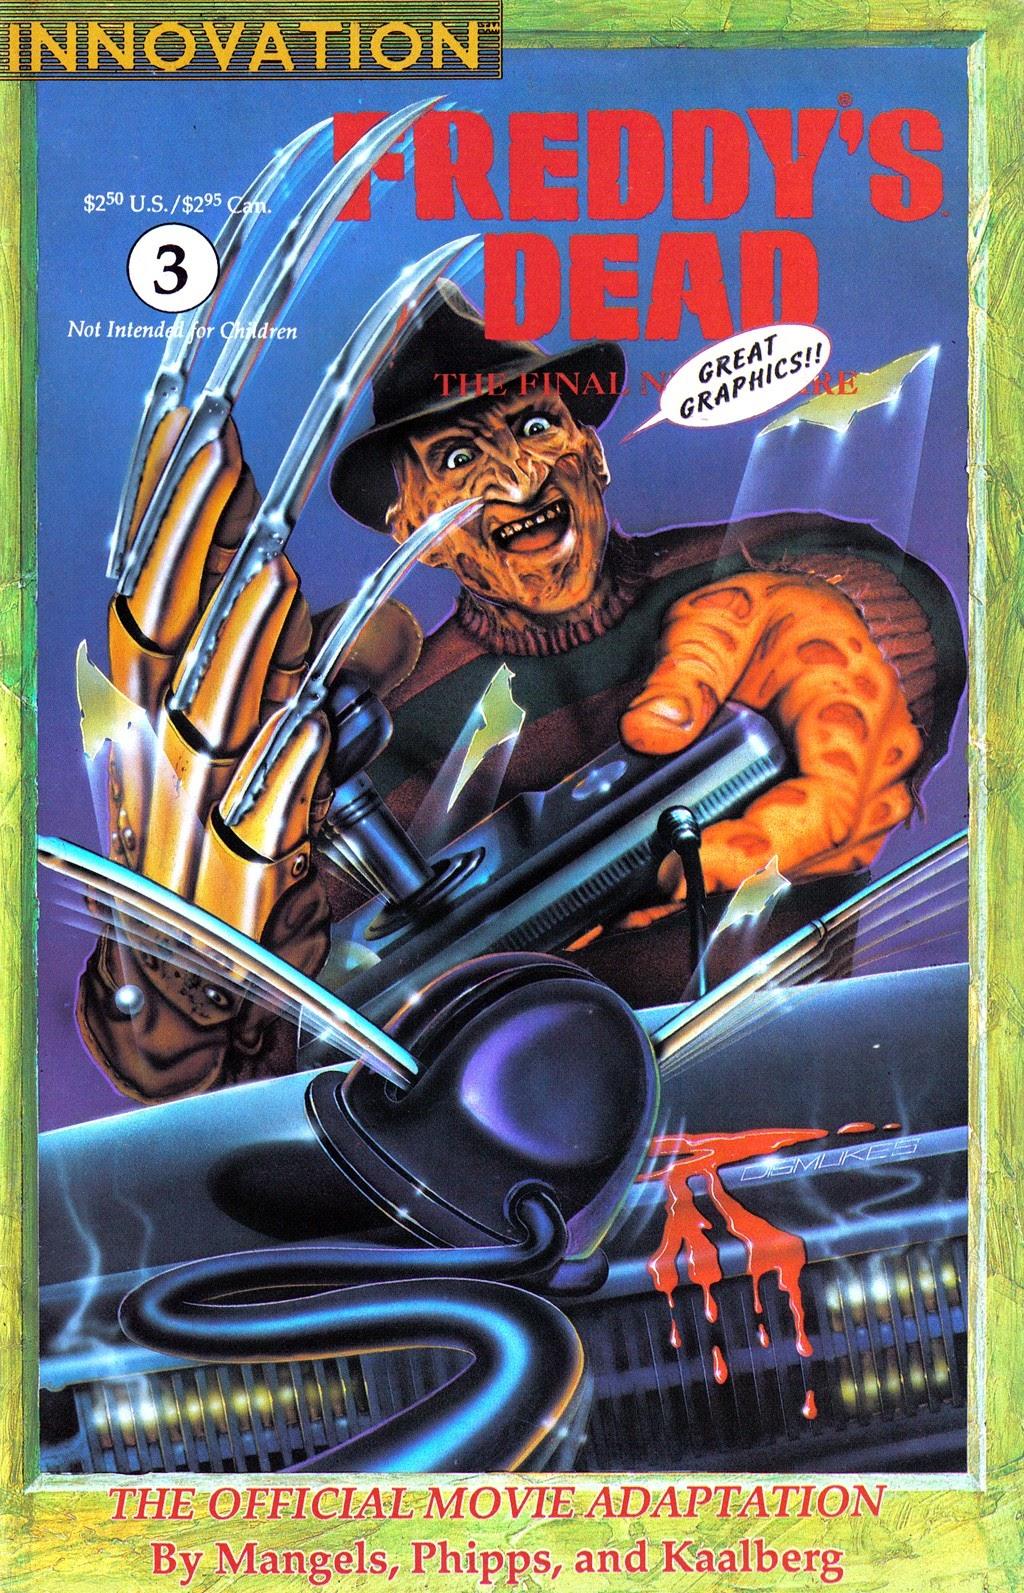 Read online Freddy's Dead: The Final Nightmare comic -  Issue #3 - 1